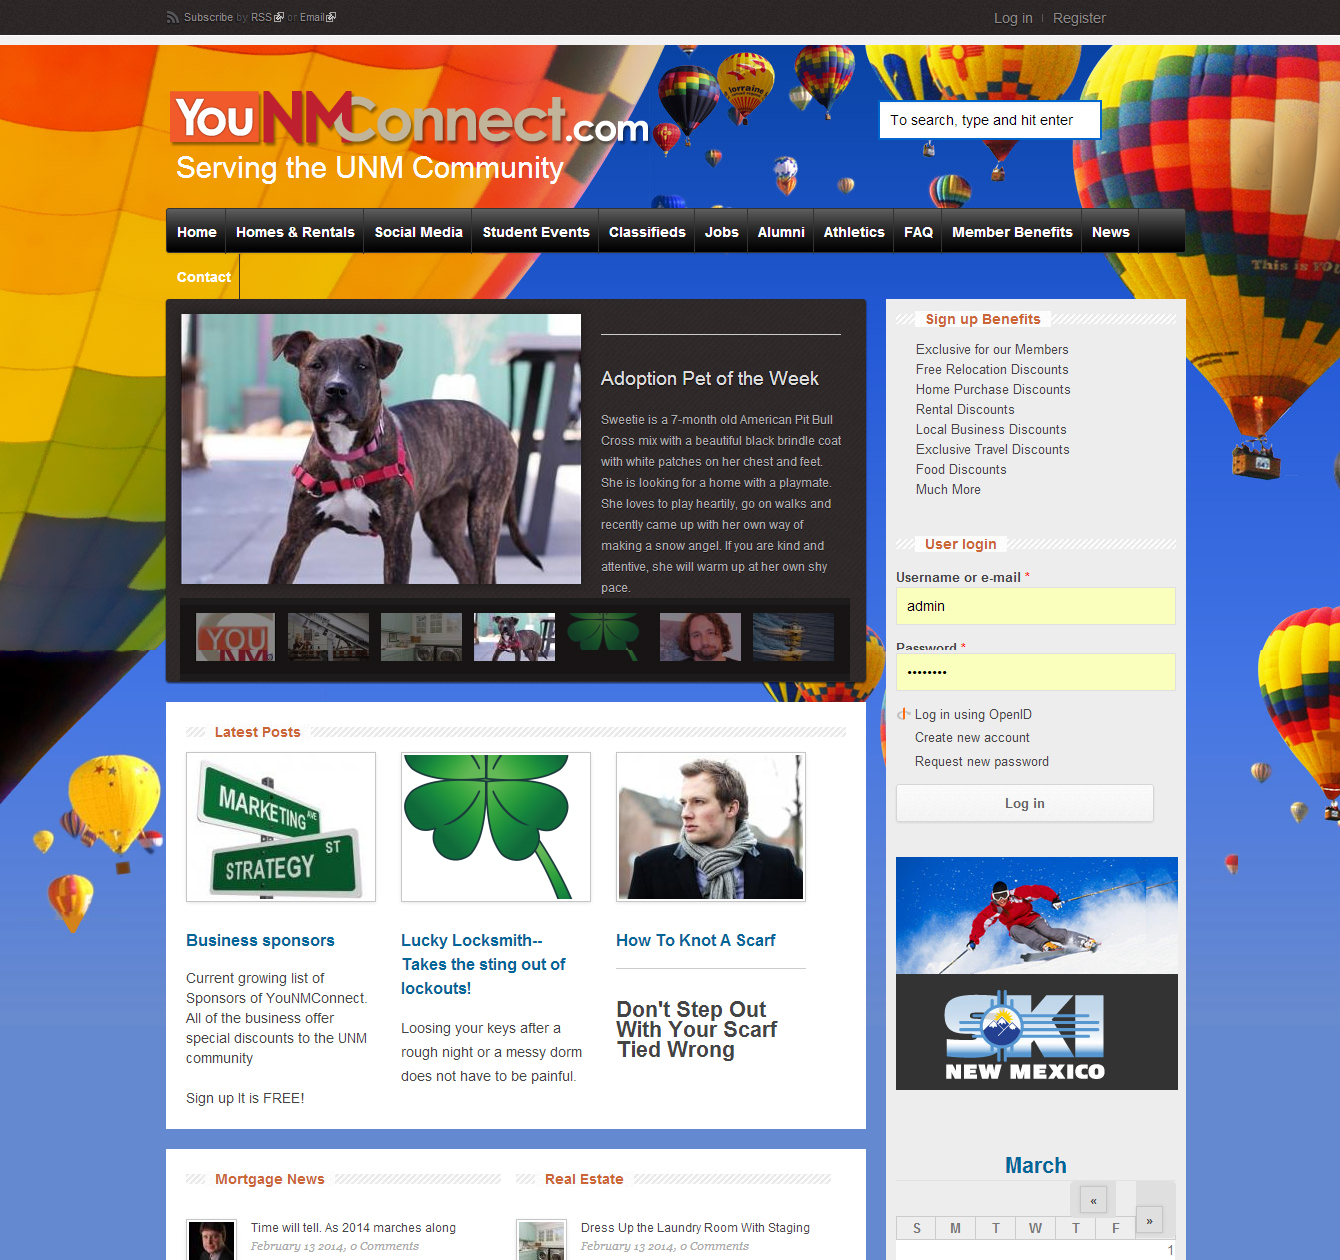 Drupal Web Design & Development in Albuquerque